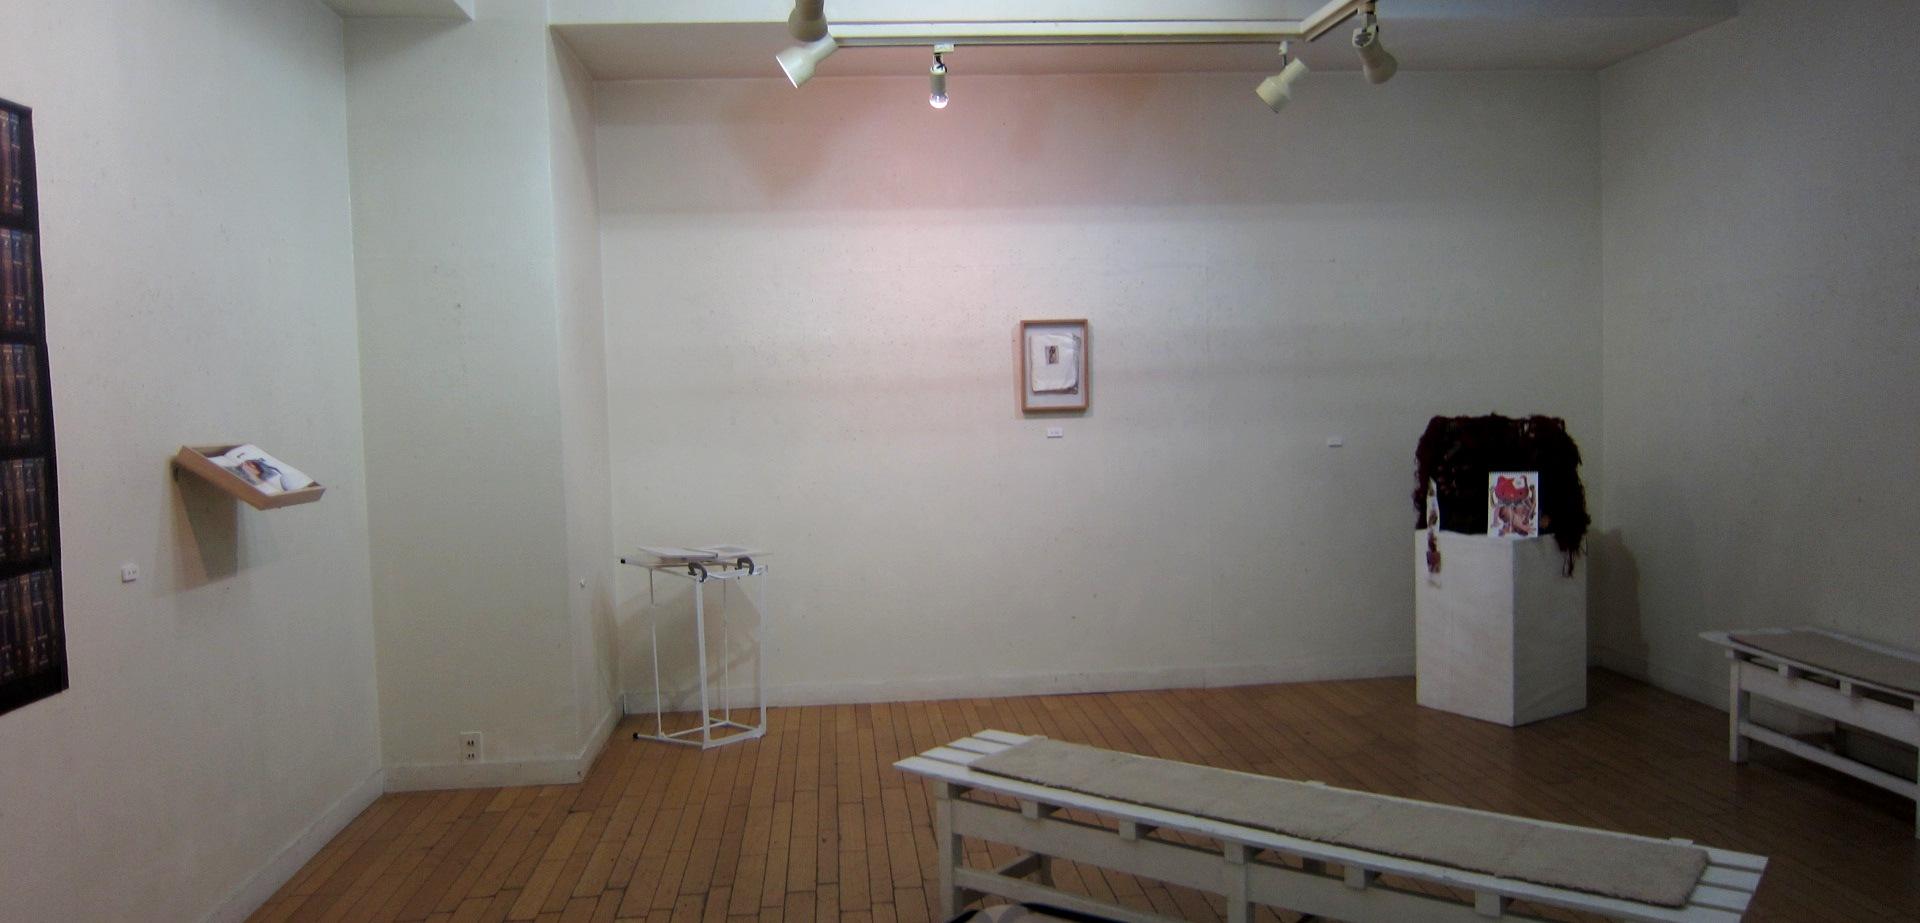 2408) 「BOOK\'S ART  9th」 たぴお 7月7日(月)~7月12日(土)_f0126829_22524412.jpg